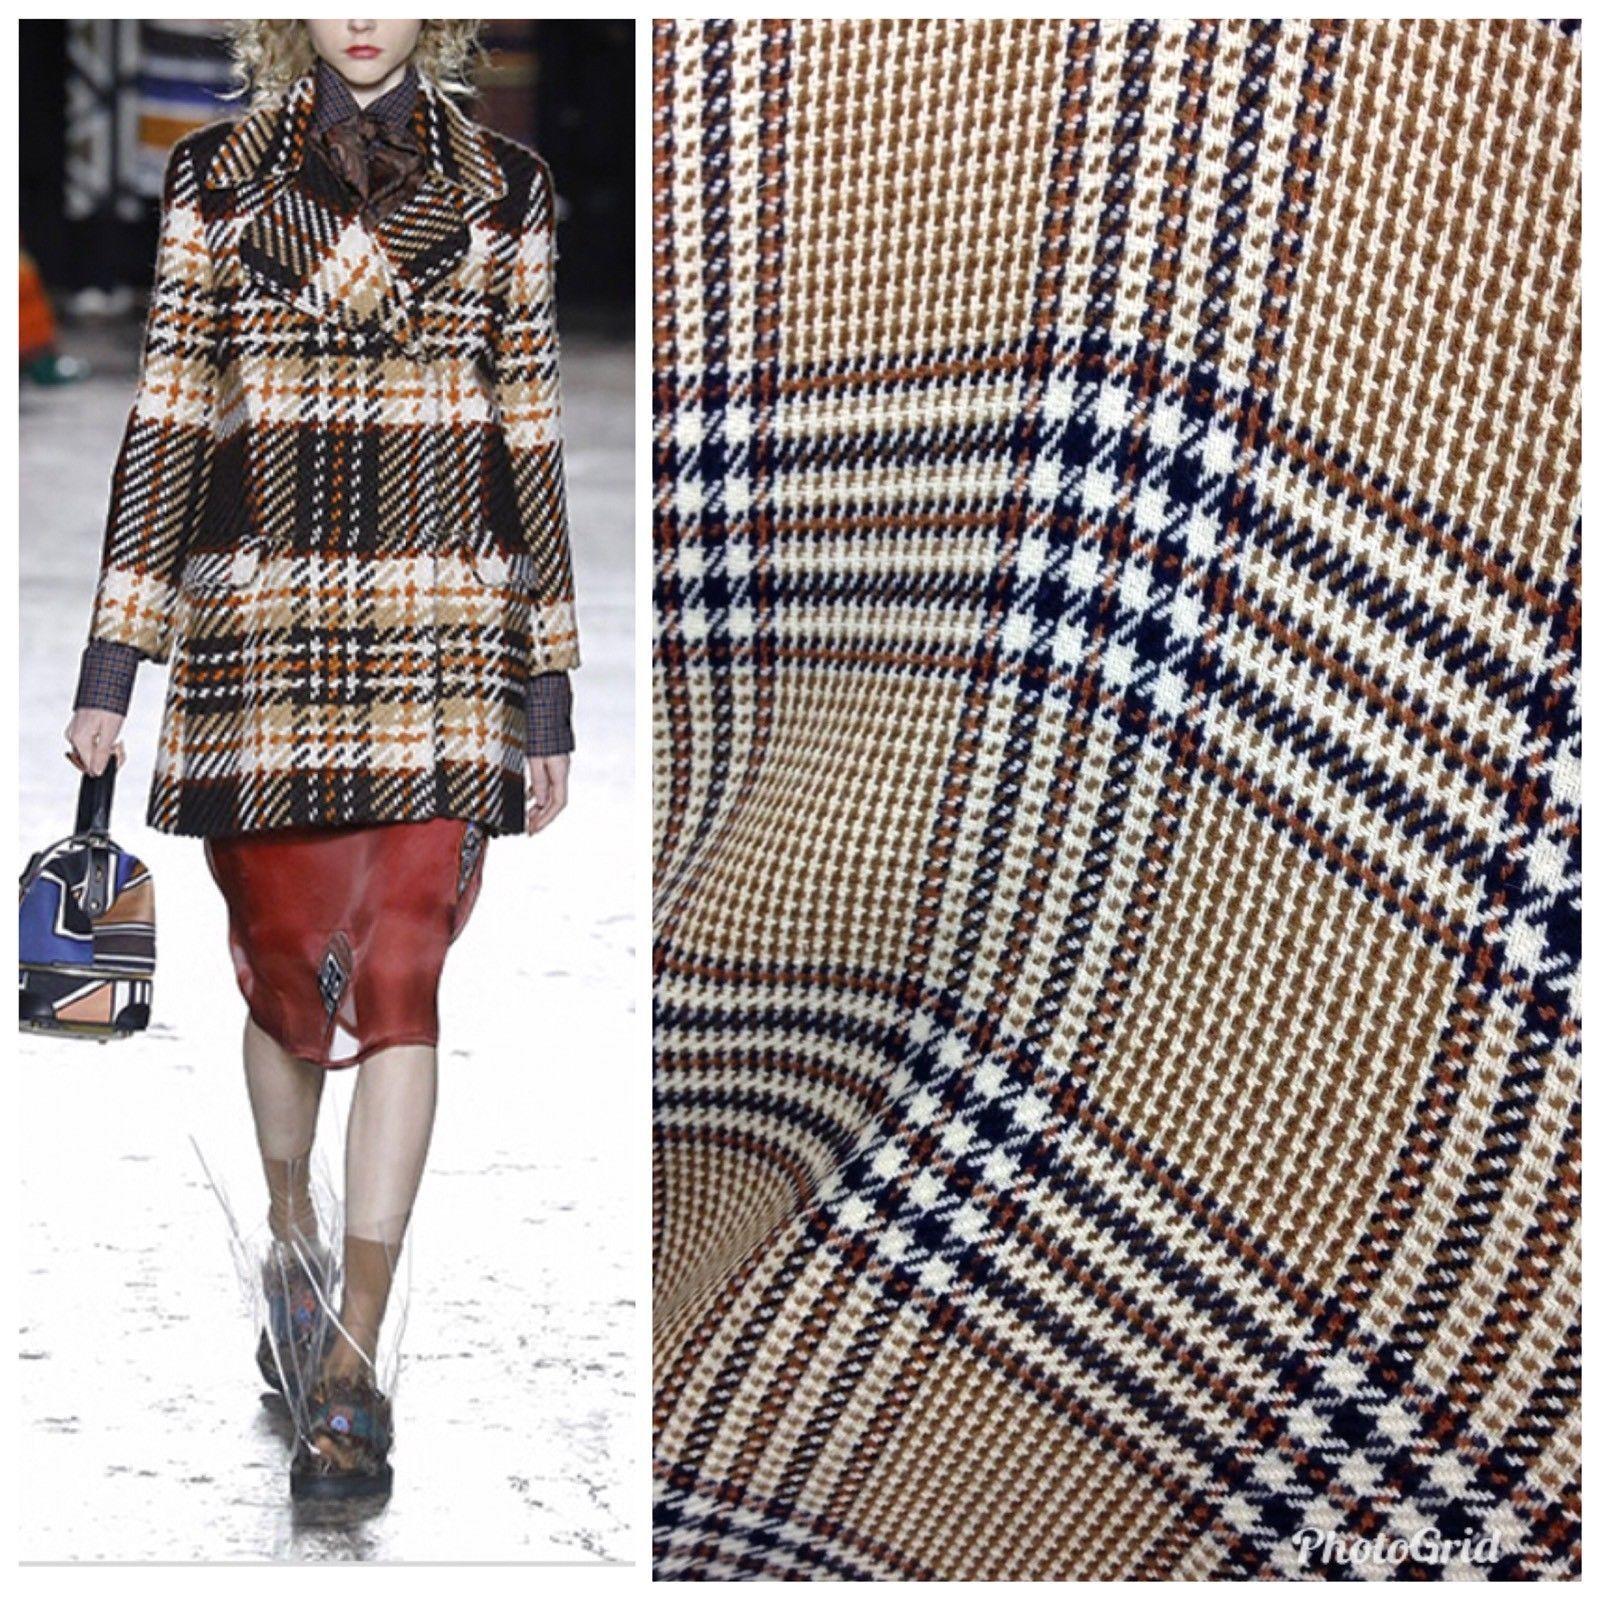 Designer 100 Cashmere Tartan Brown Plaid Fabric By The Yard 60 Wide England Plaid Fabric Tartan Fabric Folk Clothing